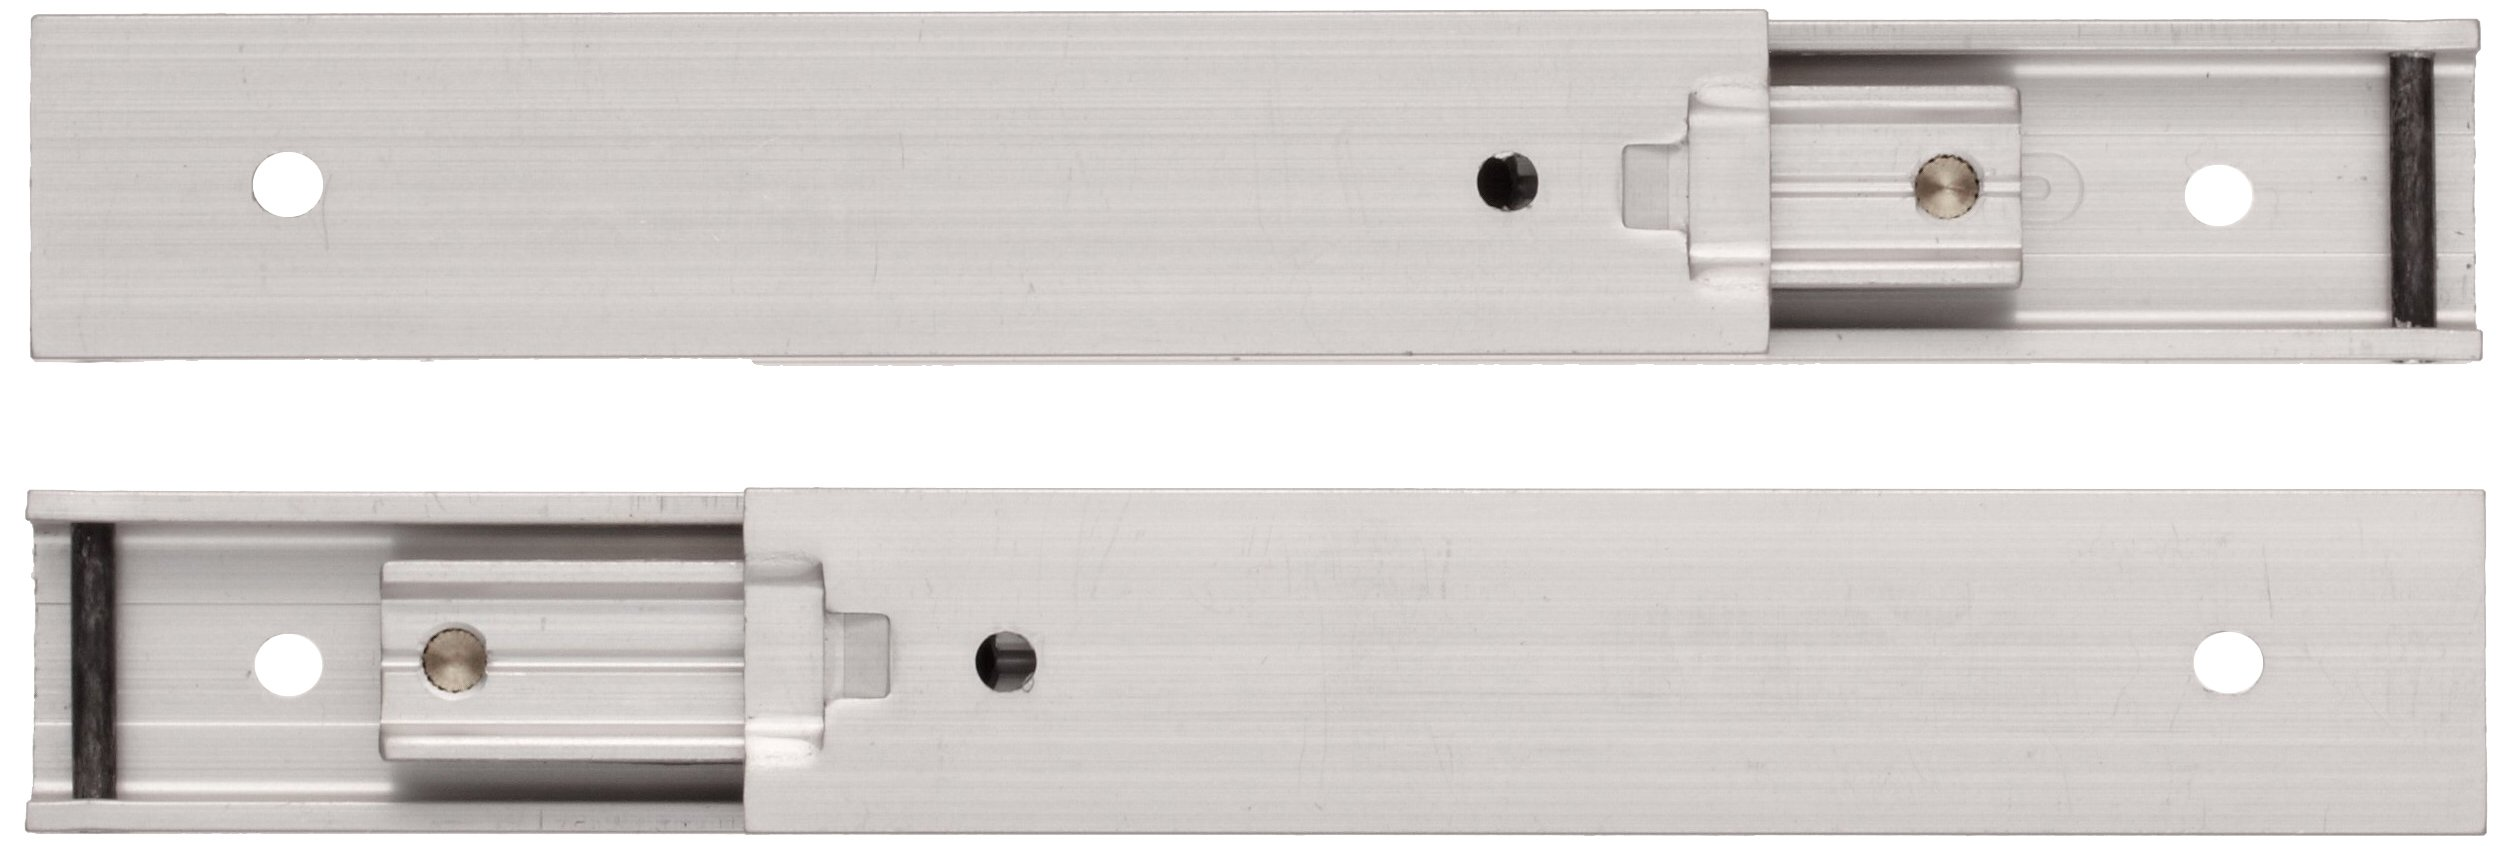 Sugastune AR3-16 Aluminum Drawer Slide, Full Extension, Positive Stop, 3-9/64'' Closed, 3-1/32'' Travel, 8.8 lbs/Pack Ld Cap (1 Pair)